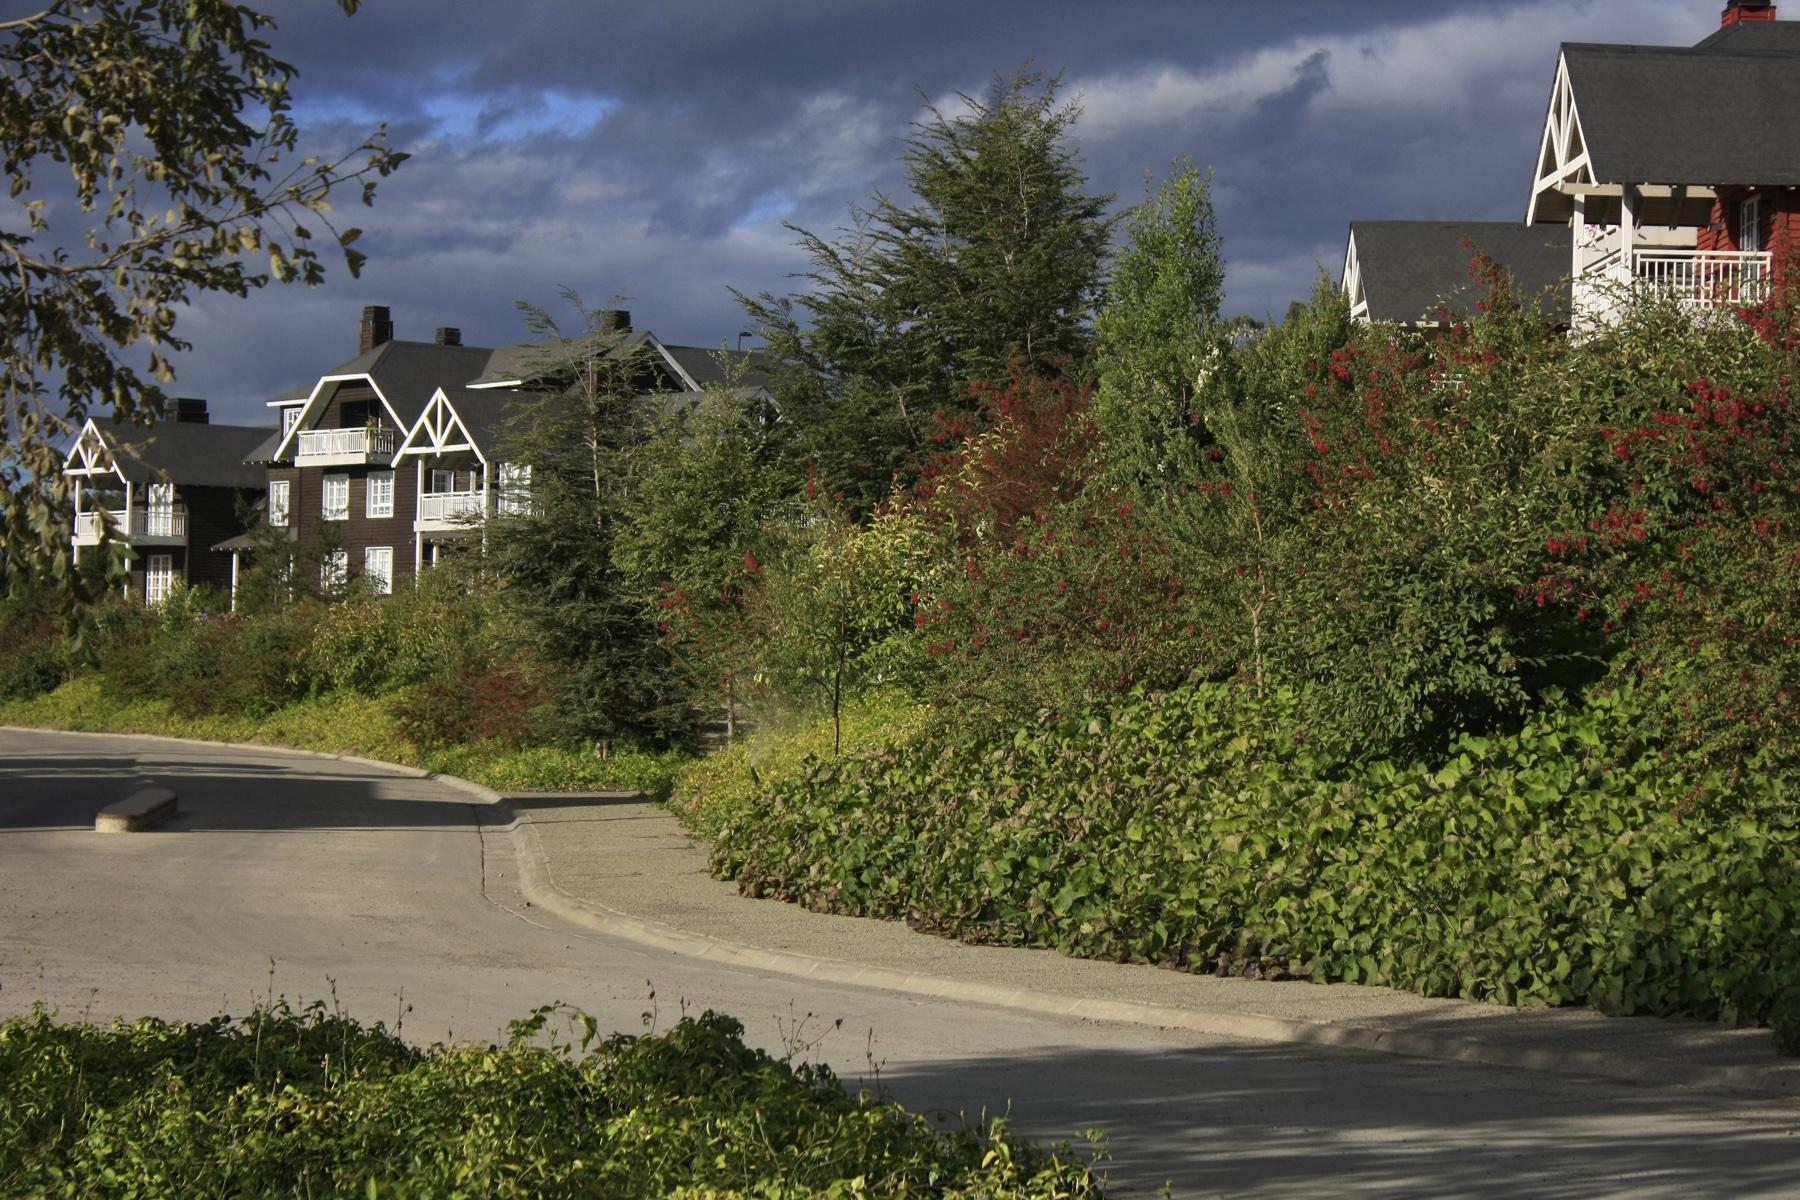 Single Family Home for Sale at Patagonia Virgin Frutillar Puerto Montt, Los Lagos Chile